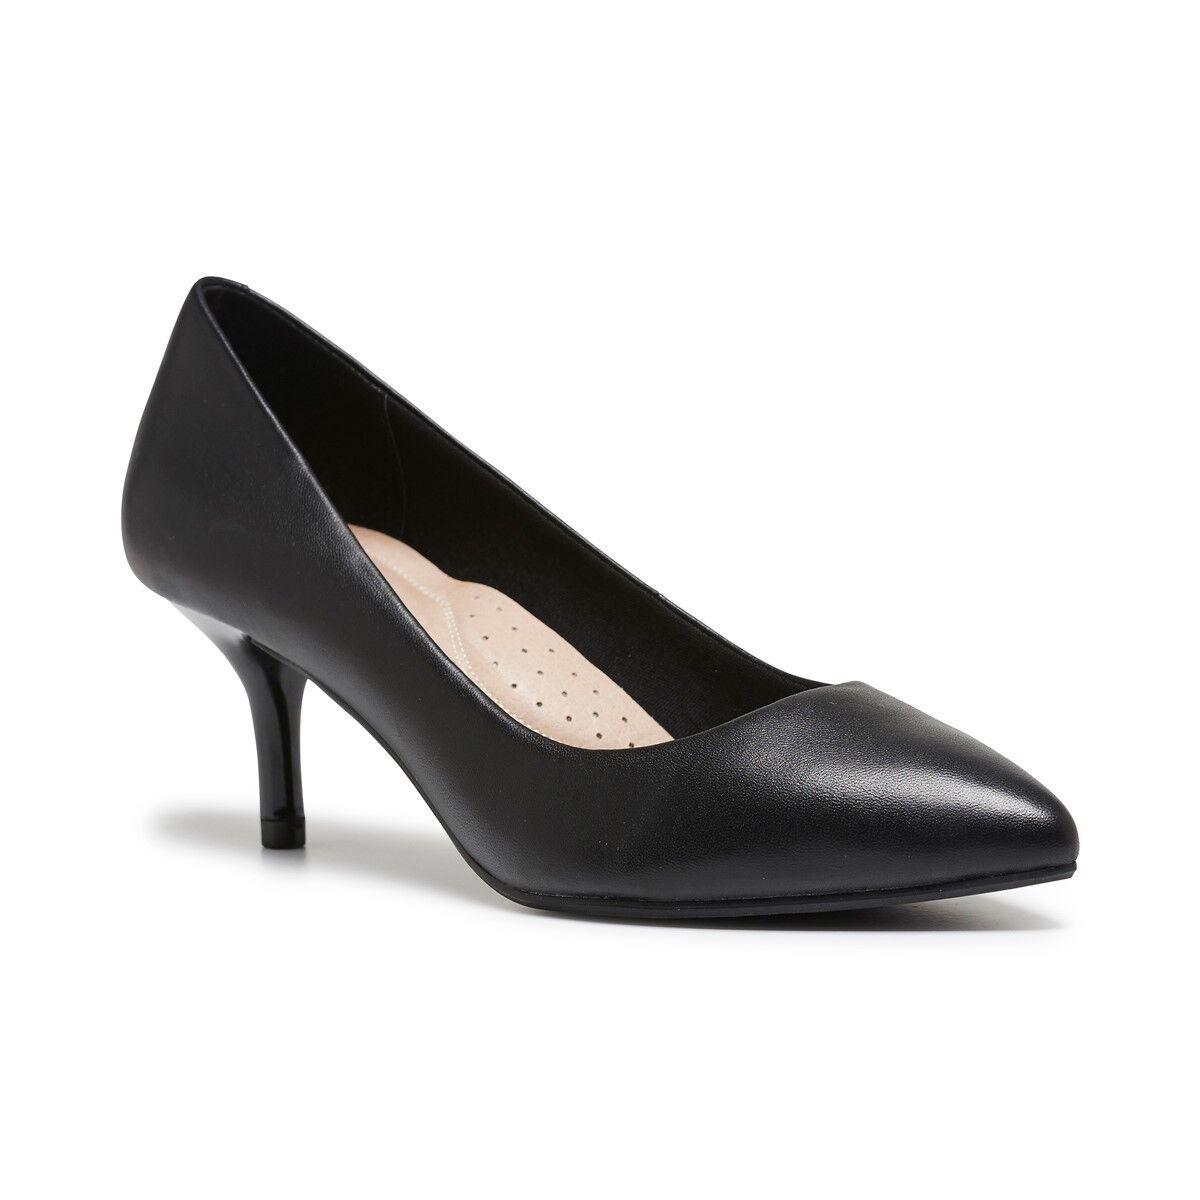 Damenschuhe HUSH PUPPIES SUZIE BLACK HEELS SLIP ON HIGH HEEL HEELS BLACK Schuhe WORK DRESS 93d134